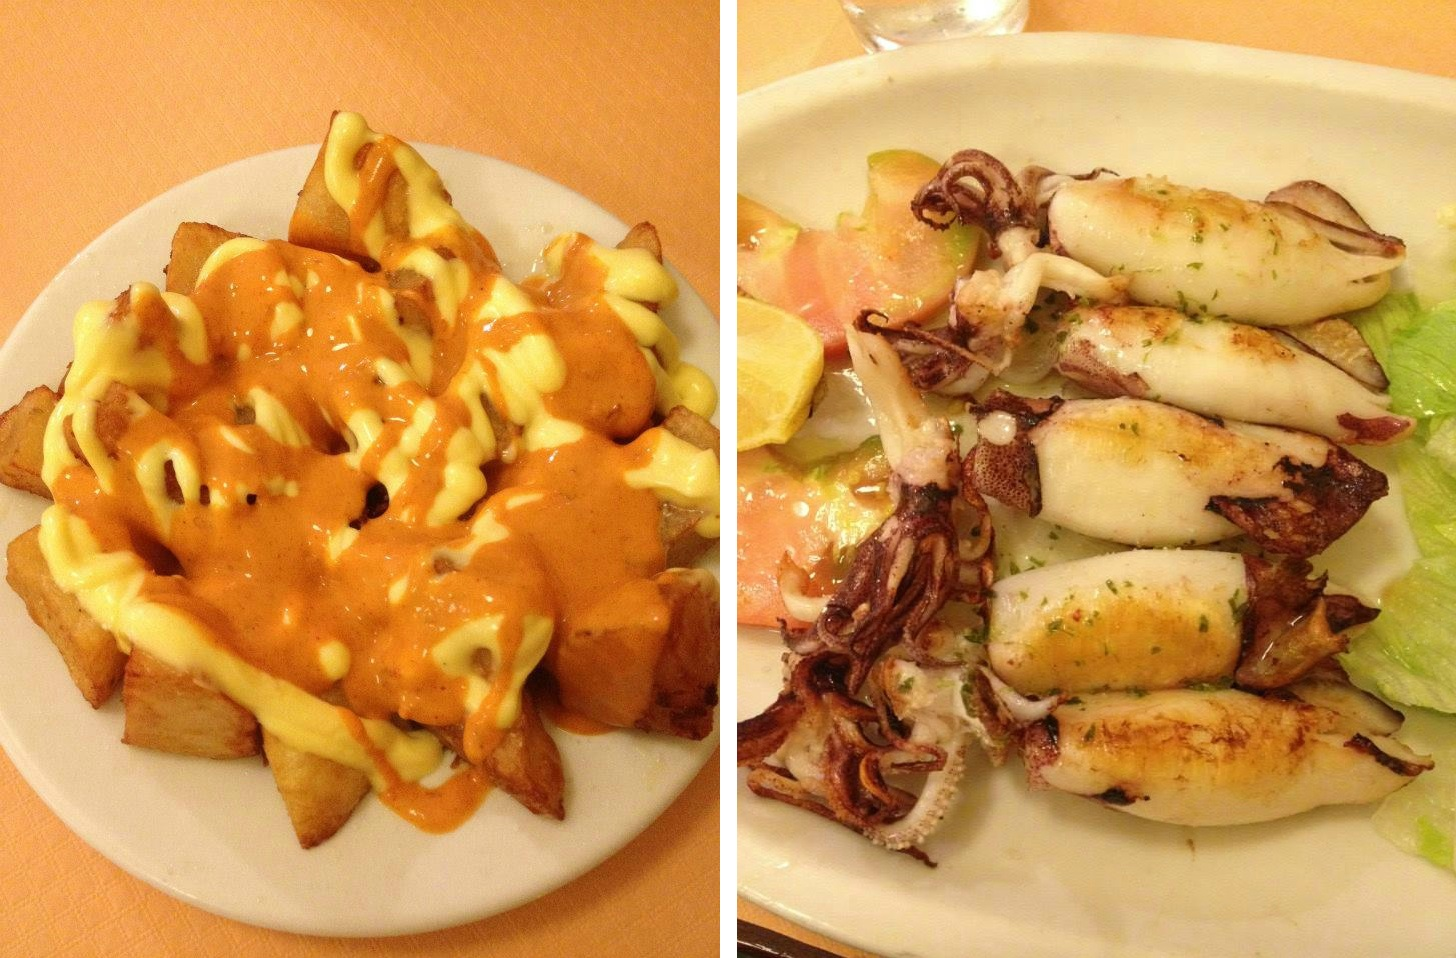 Patatas bravas & pimientos del padron